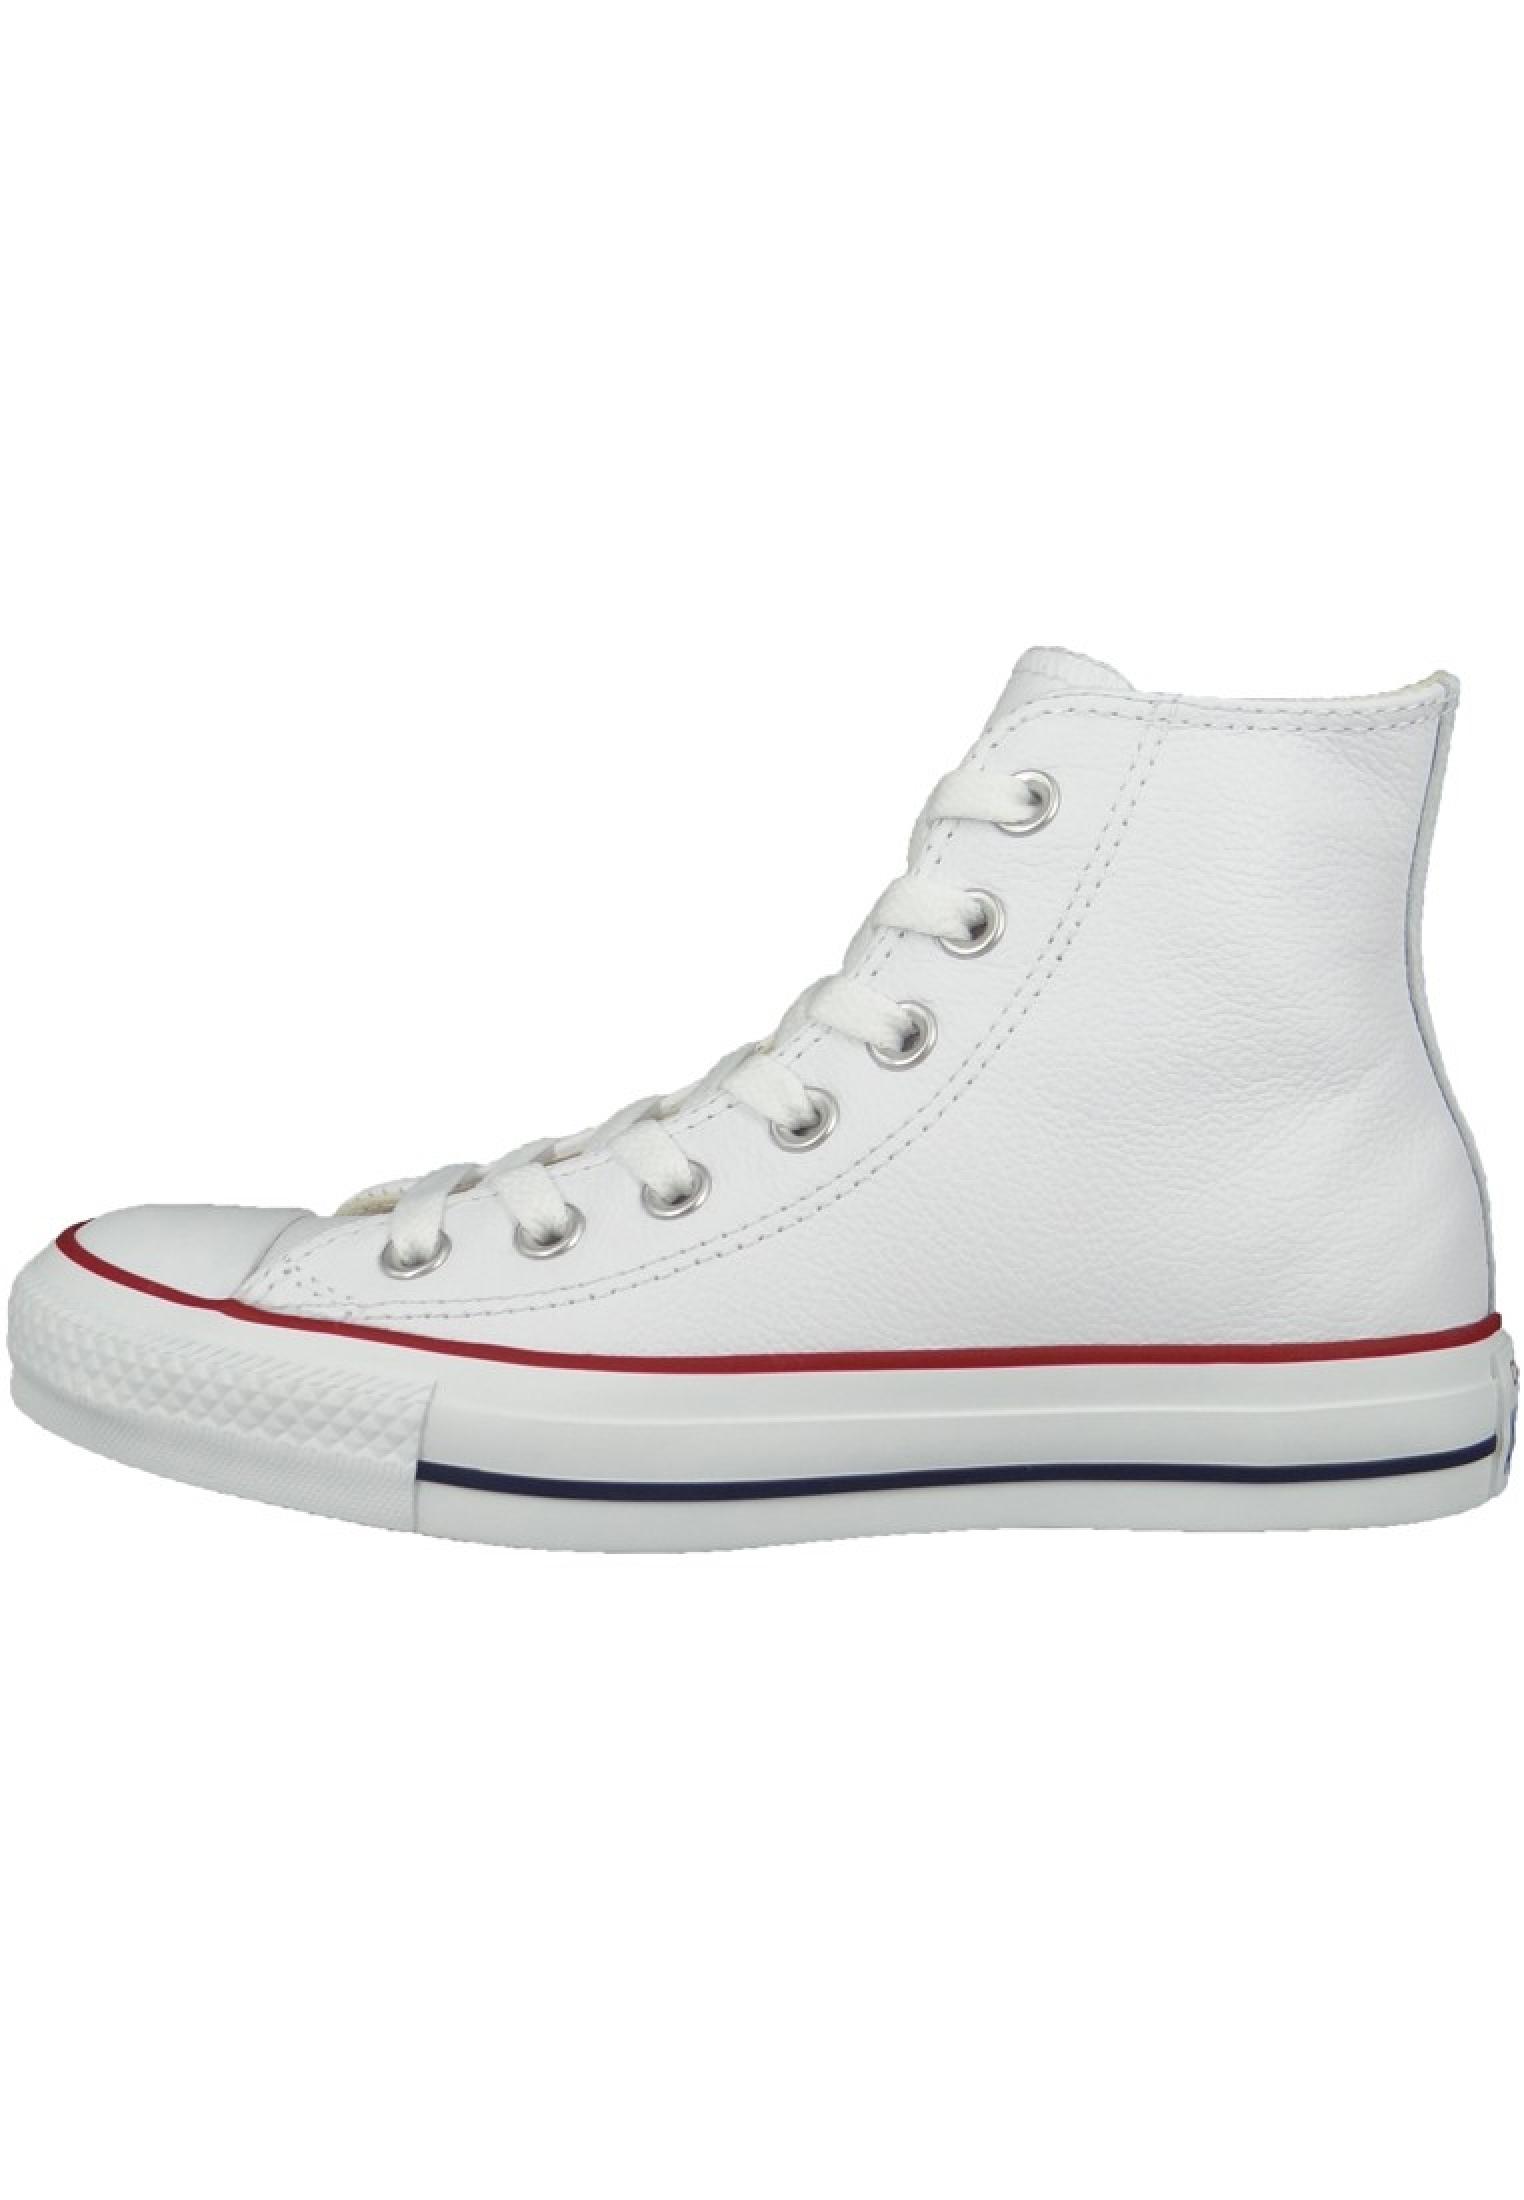 converse chucks leder white wei ct as classic lea 132169c. Black Bedroom Furniture Sets. Home Design Ideas